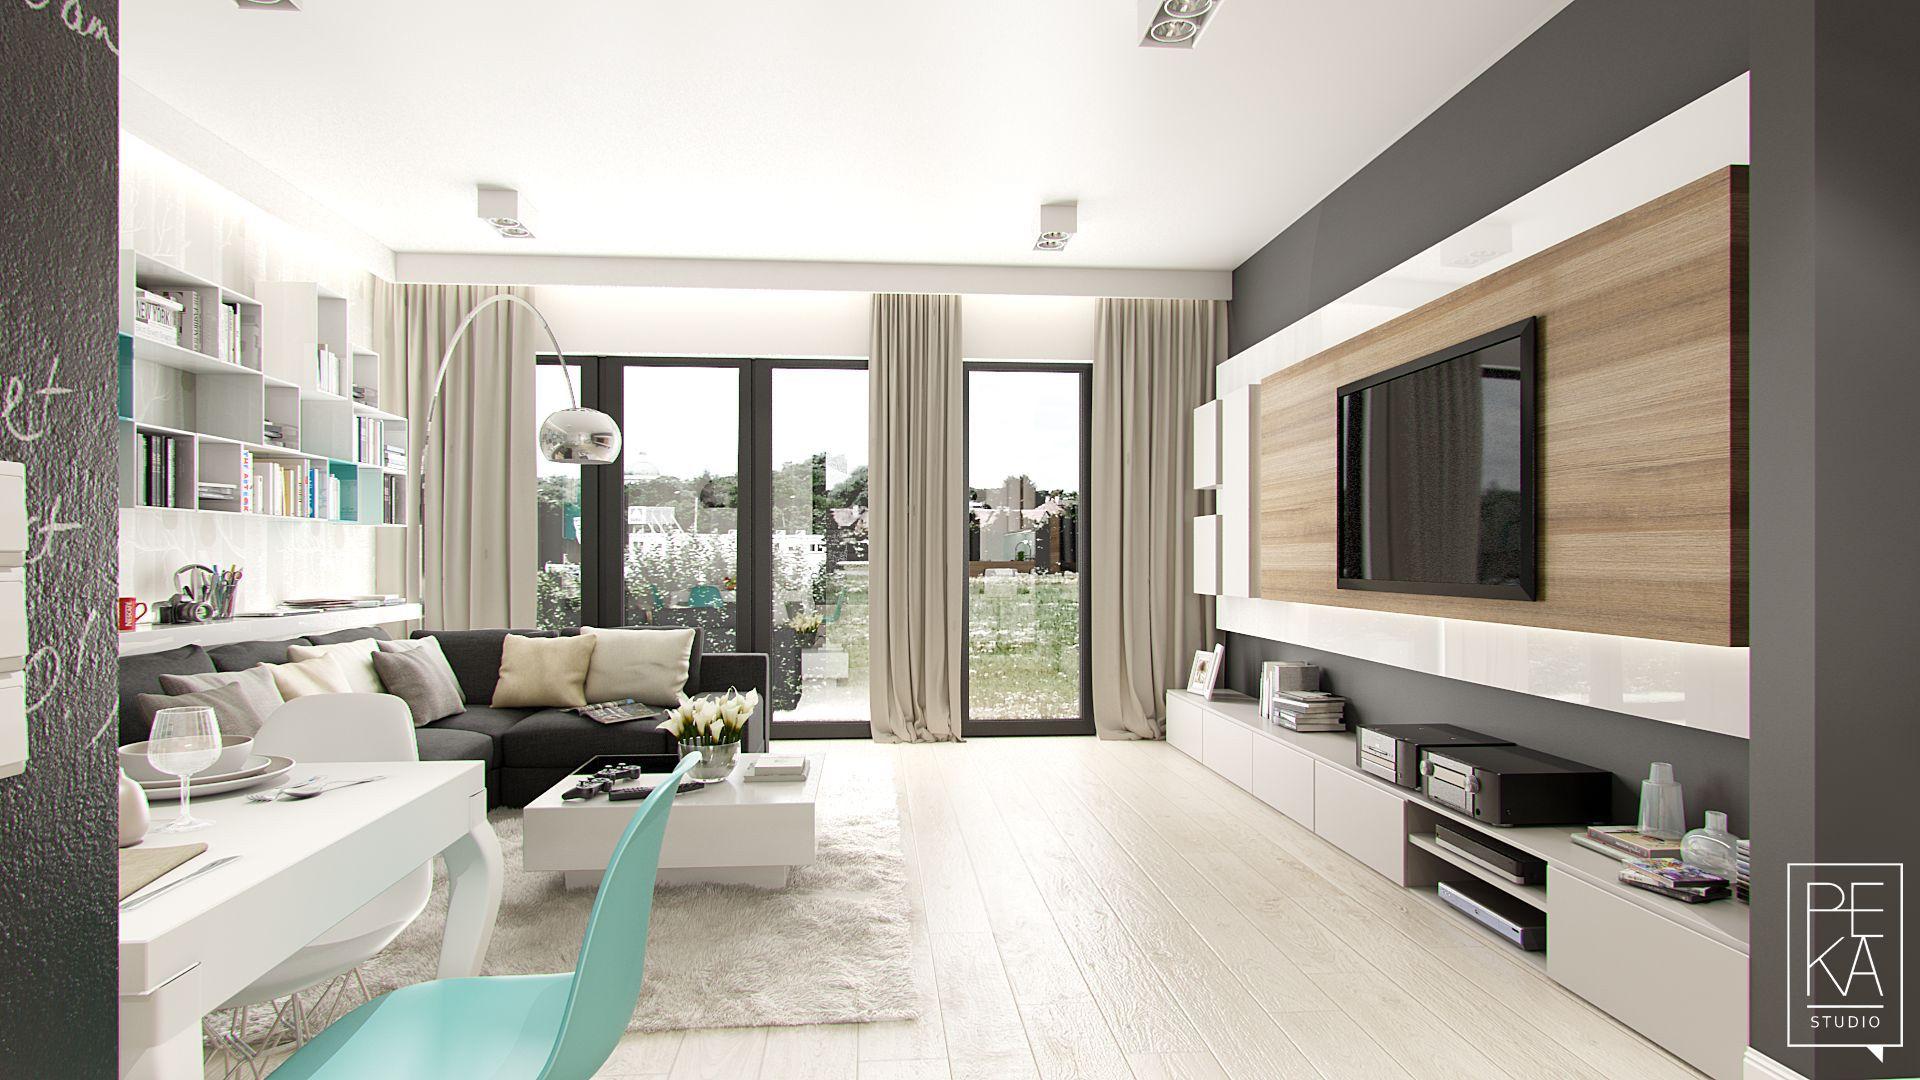 Living room by PEKA STUDIO MODERN